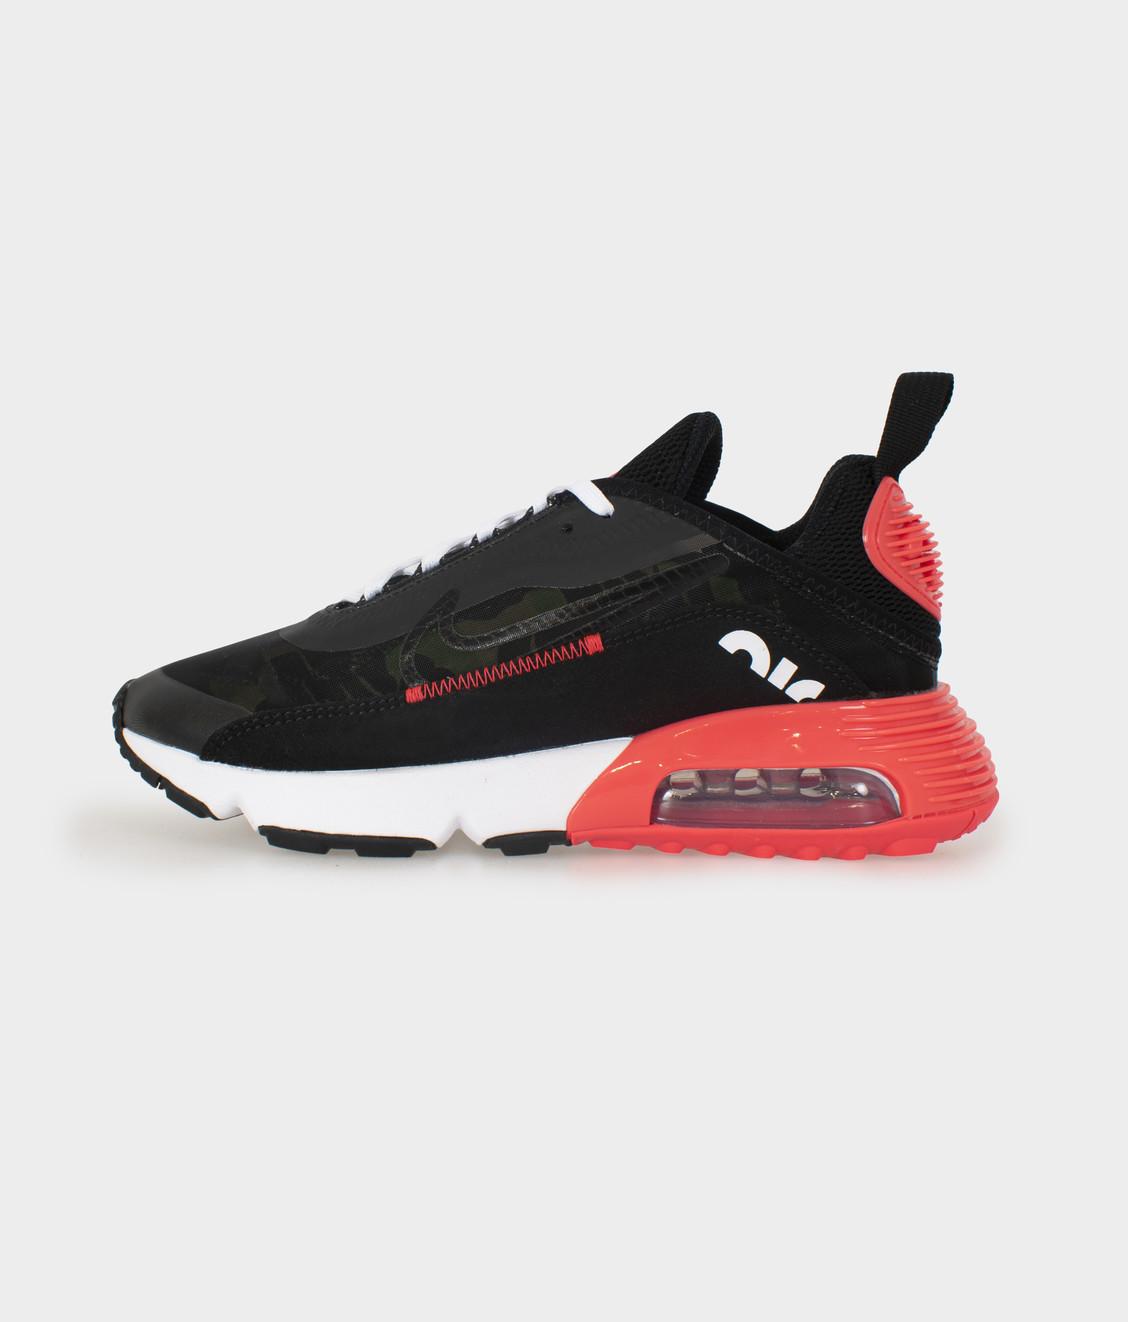 Nike Nike Air Max 2090 Reverse Duck Camo